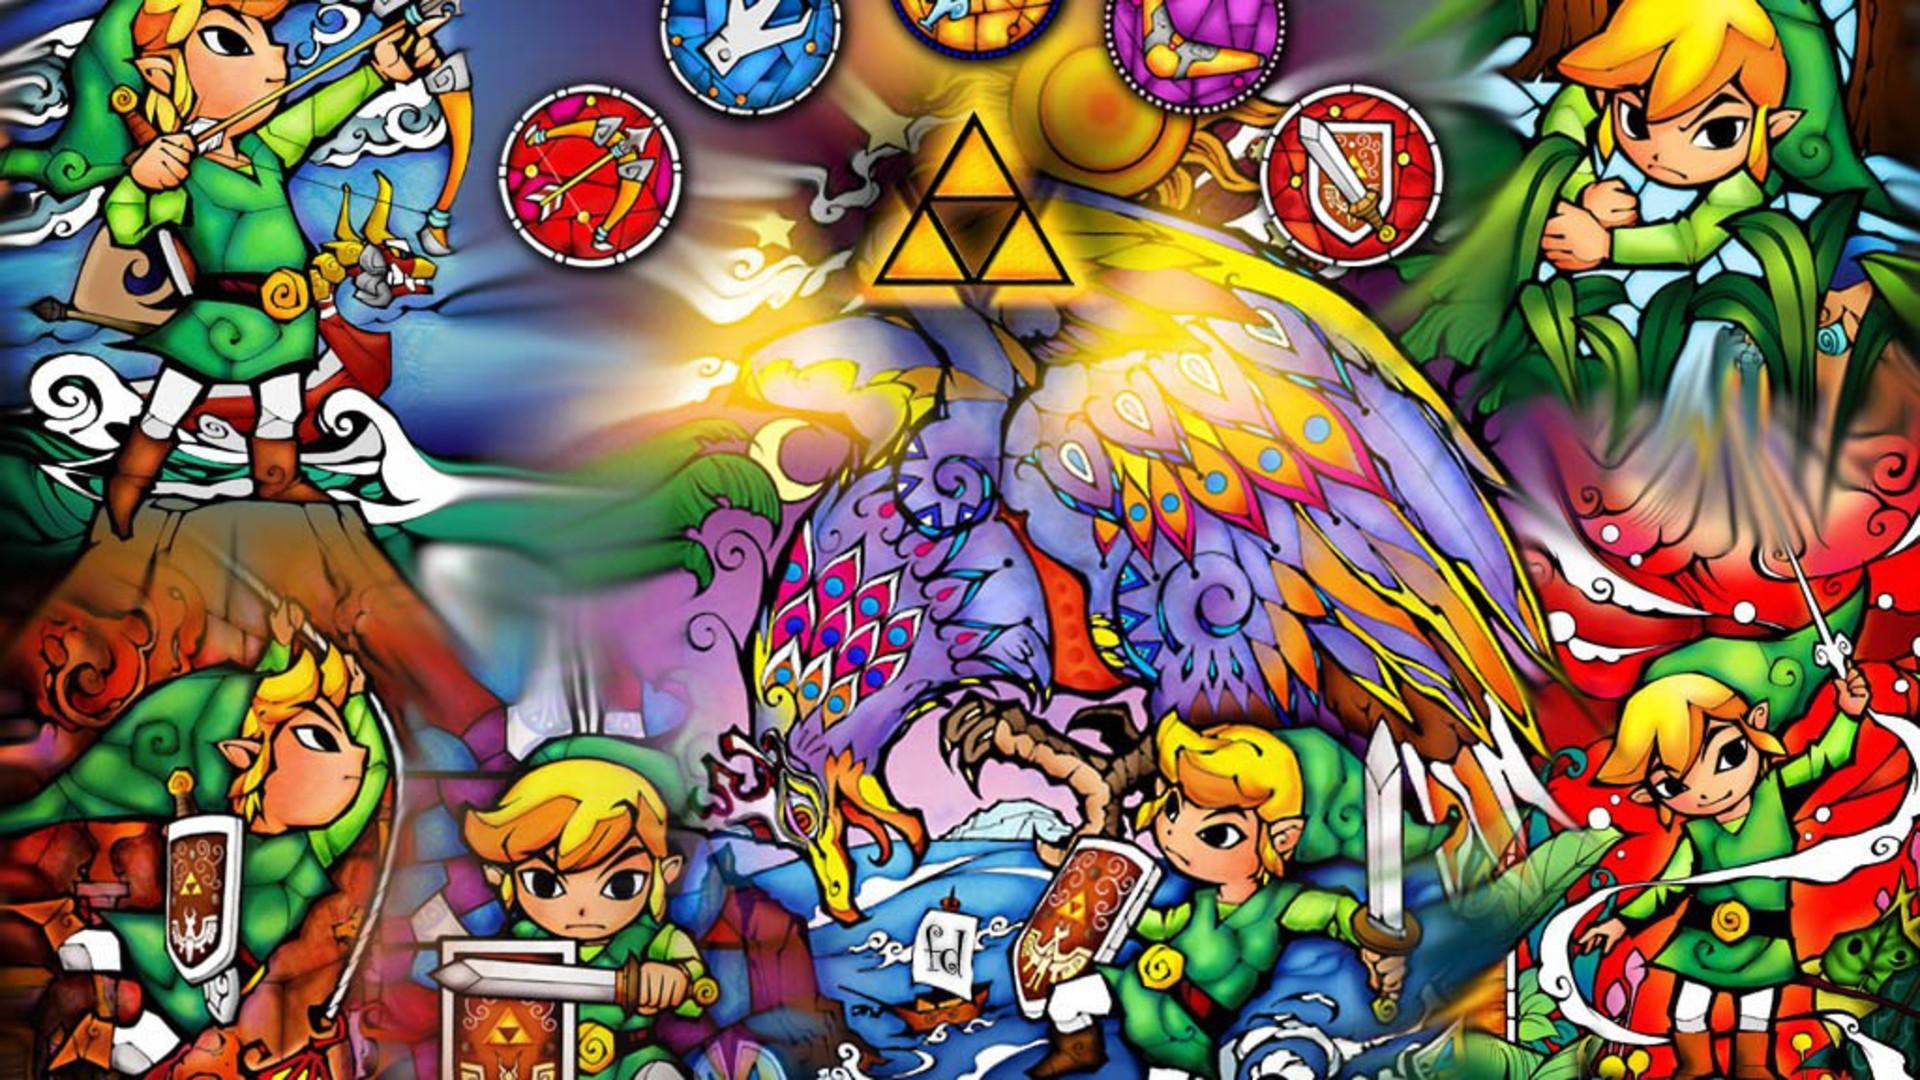 Res: 1920x1080, video games, Link, triforce, The Legend of Zelda - Free Wallpaper /  WallpaperJam.com